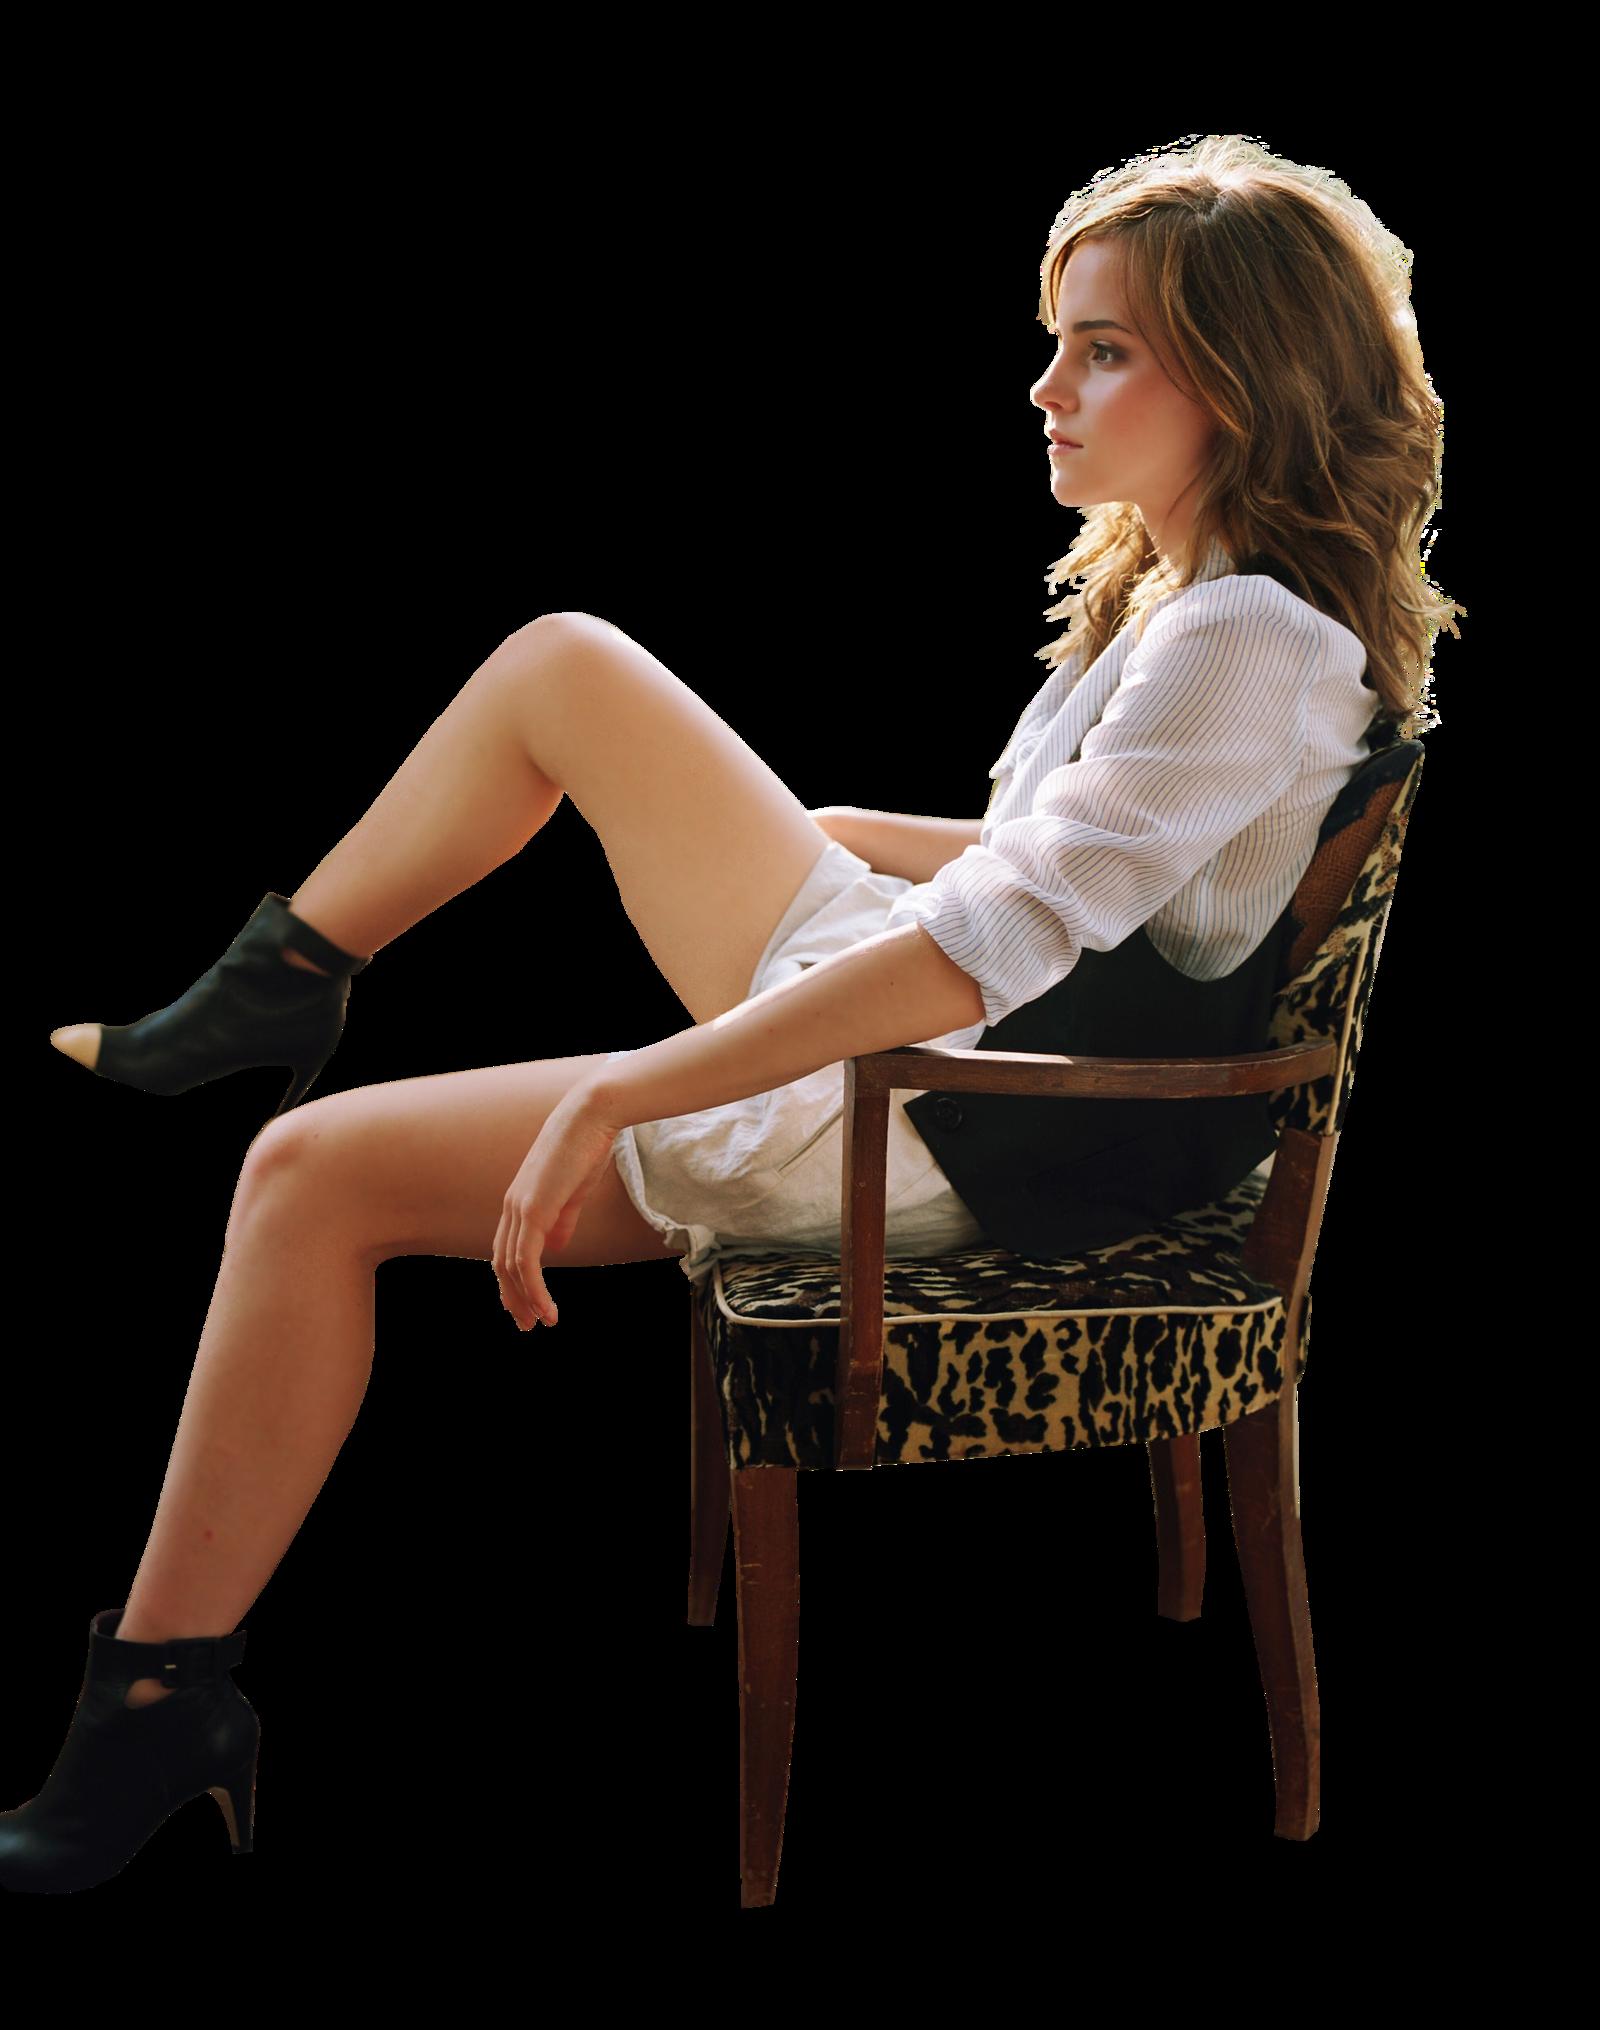 Decepticon44 6 0 Emma Watson hot 049x by Decepticon44 - Emma Watson PNG